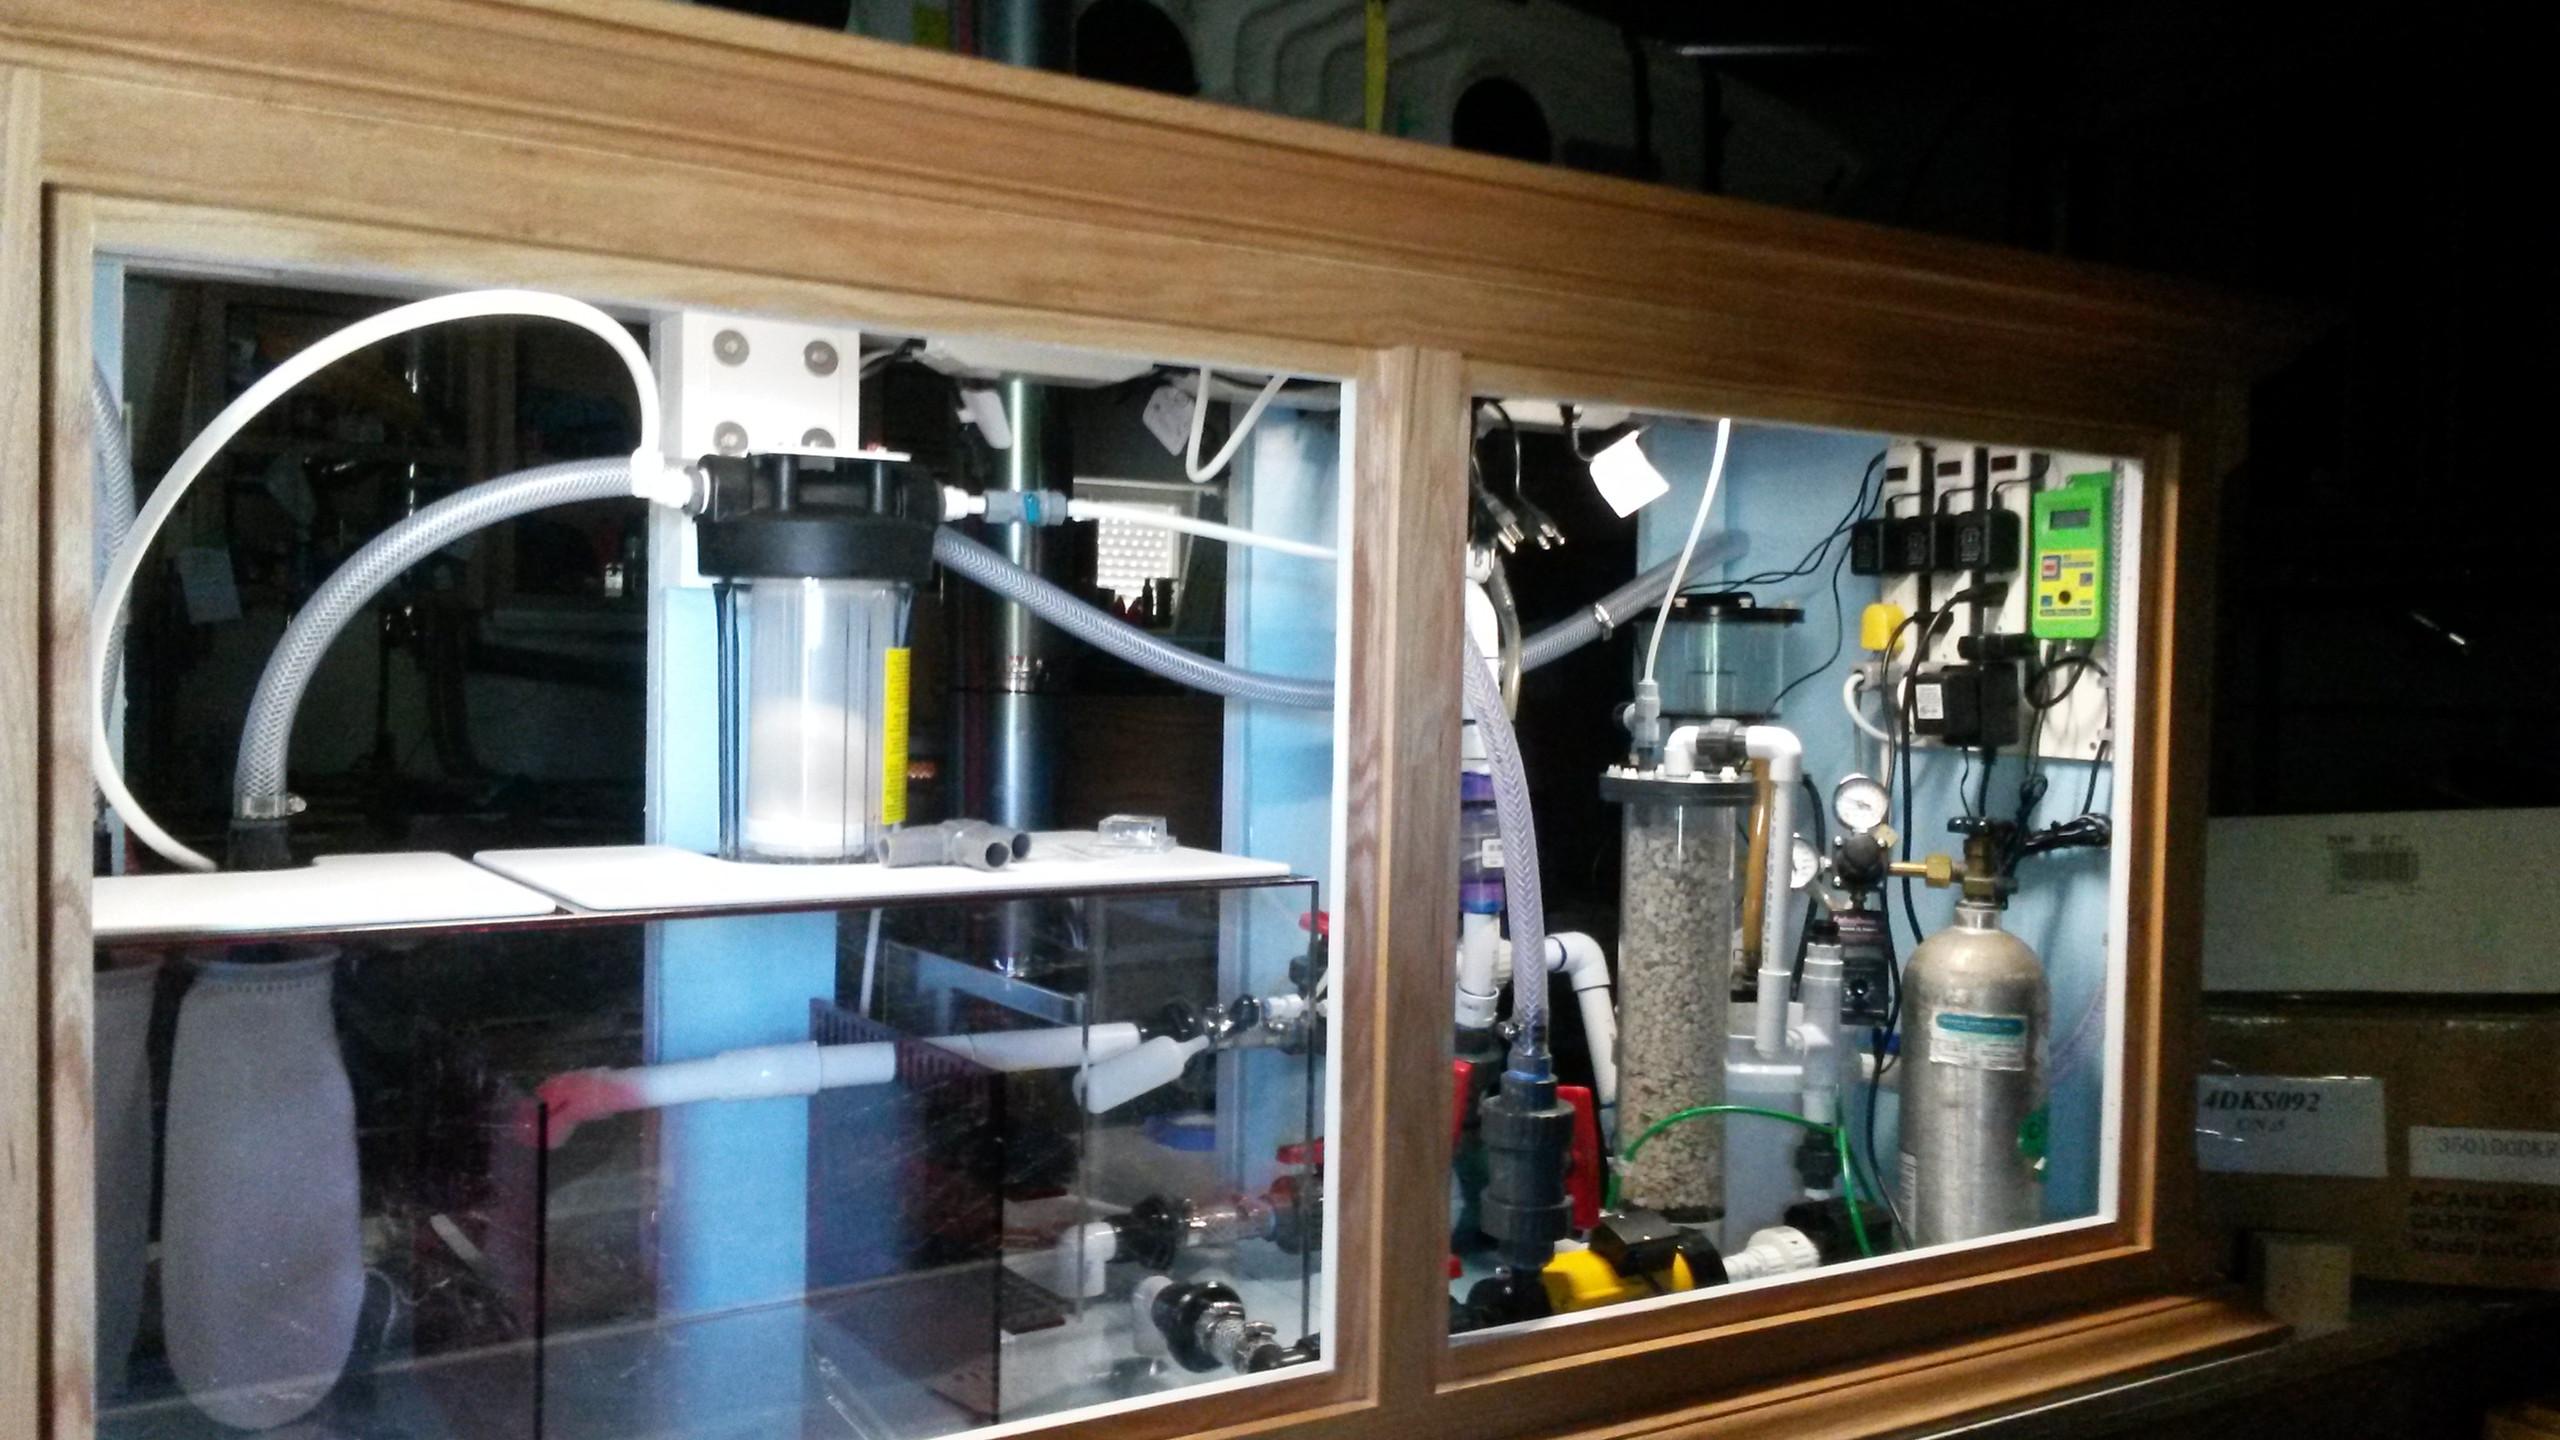 6-Under Cabinet Lighting Installed